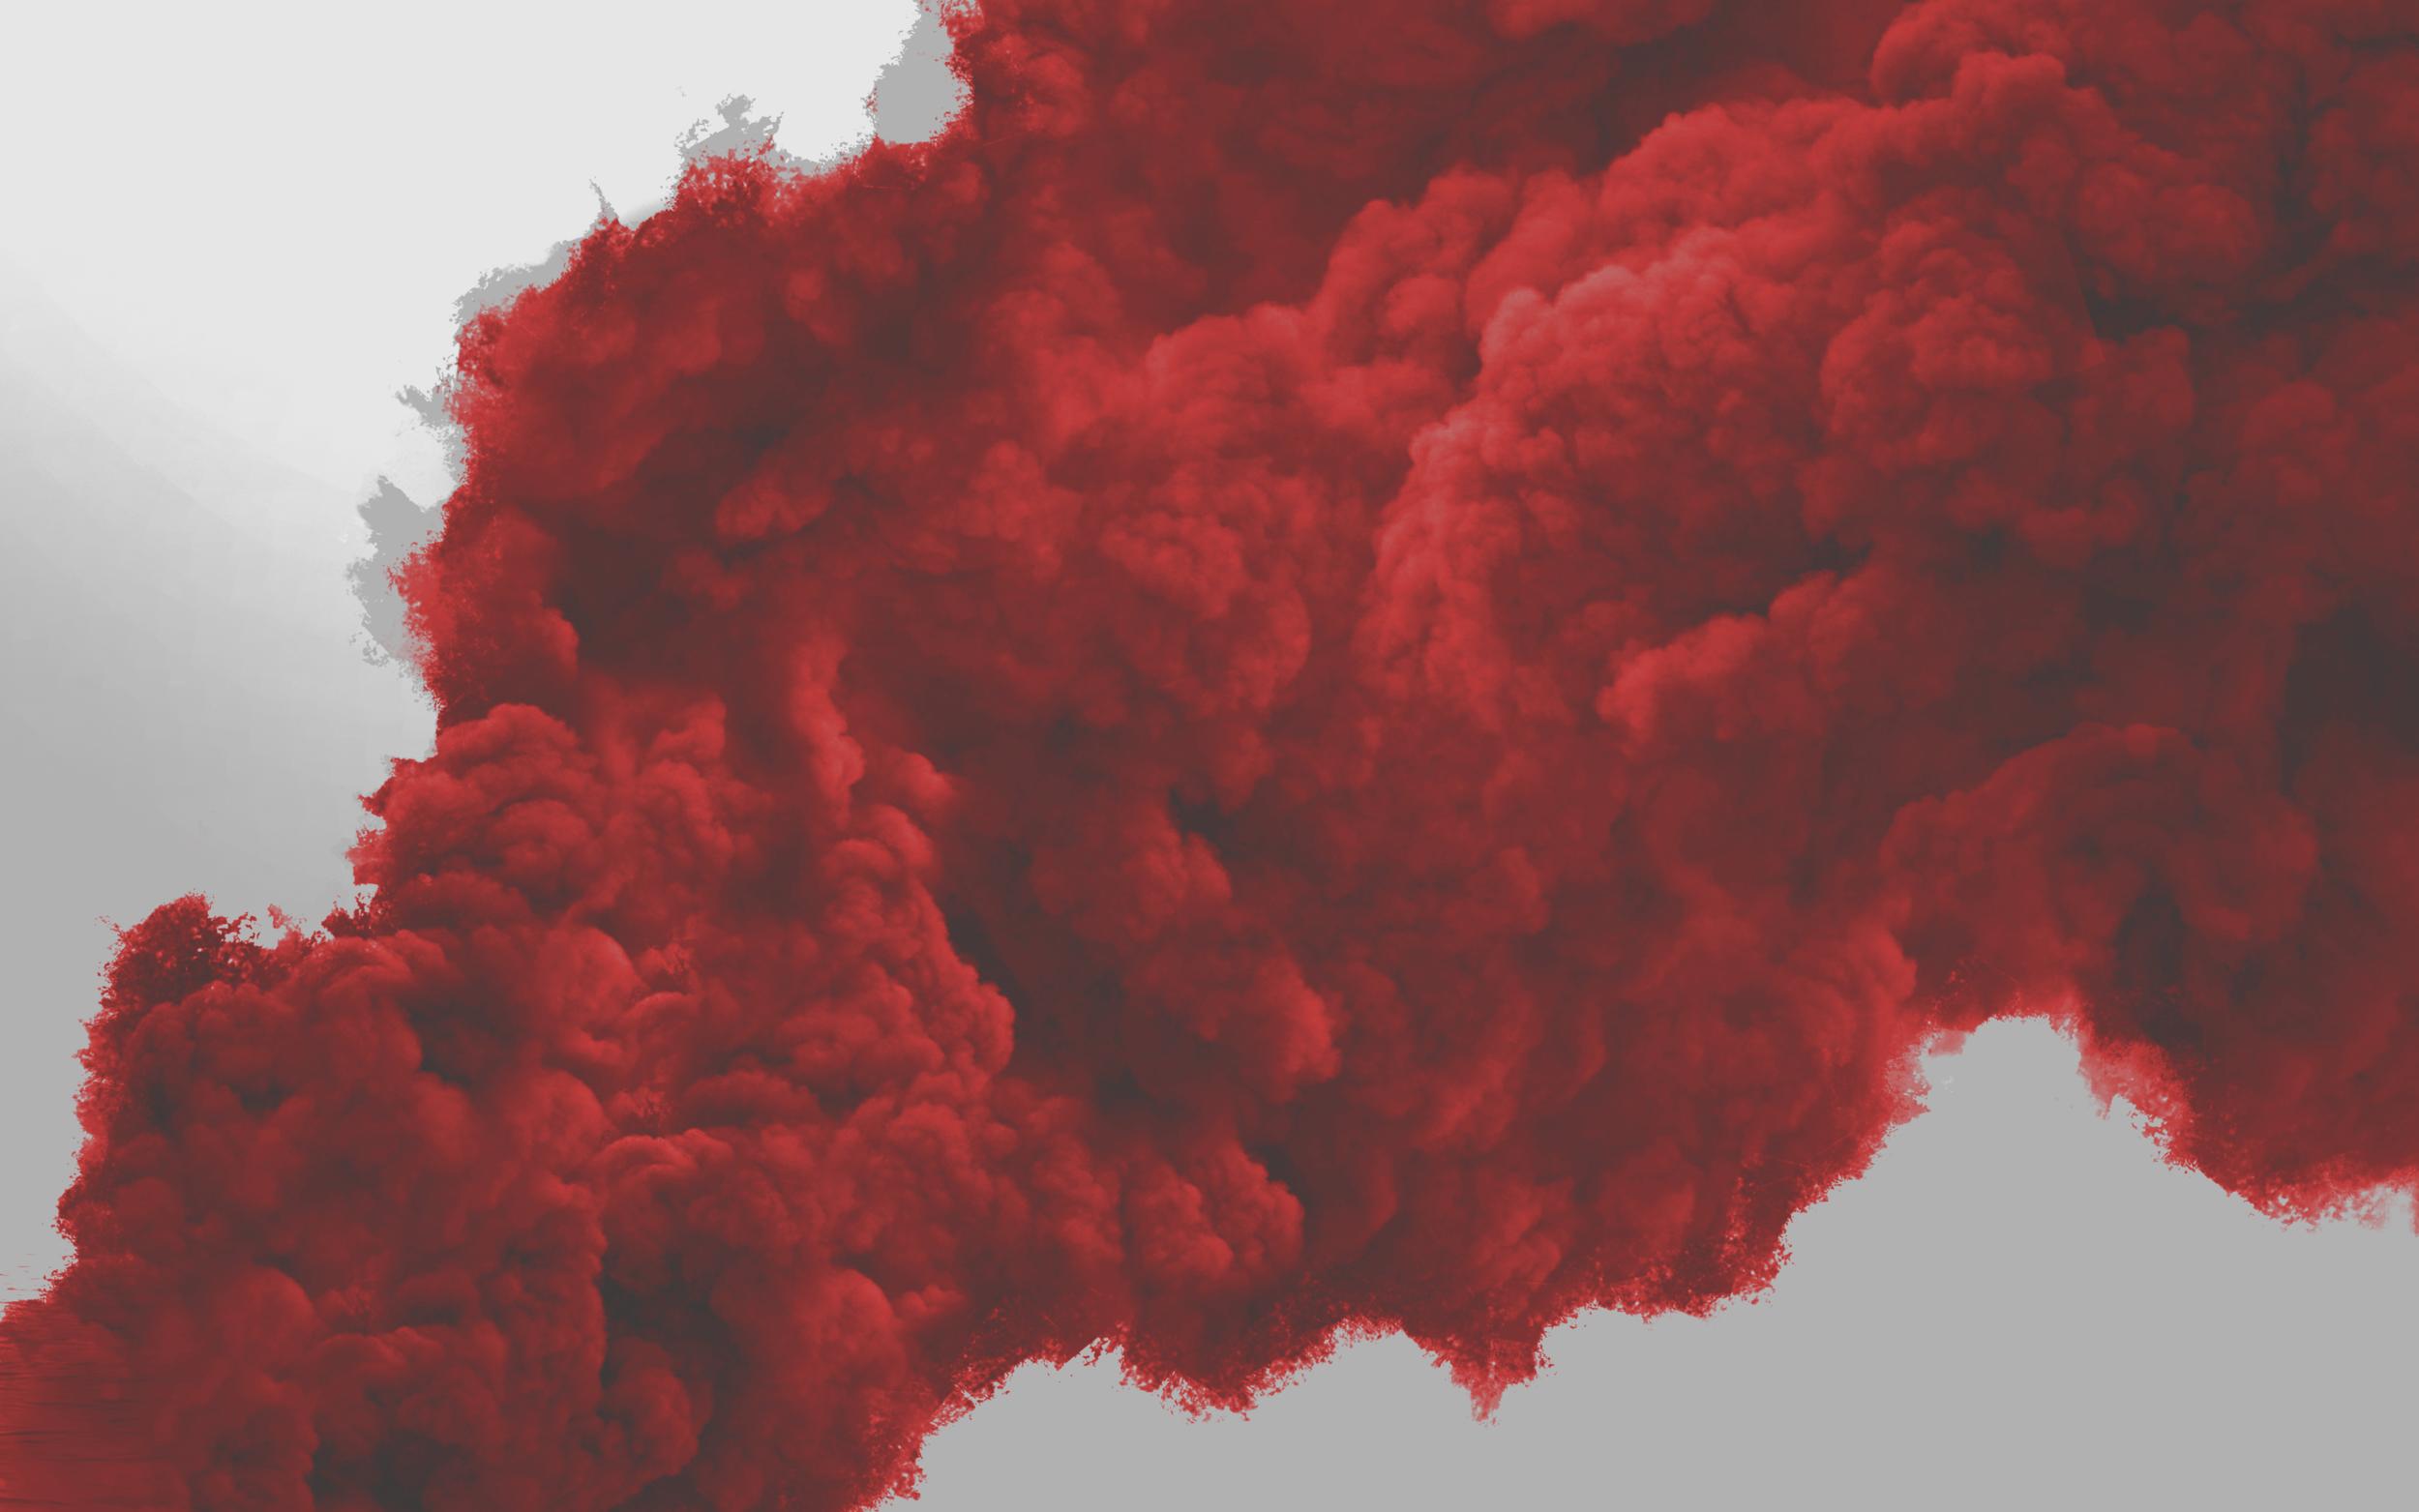 Top Five Red Smoke Png Image - Circus